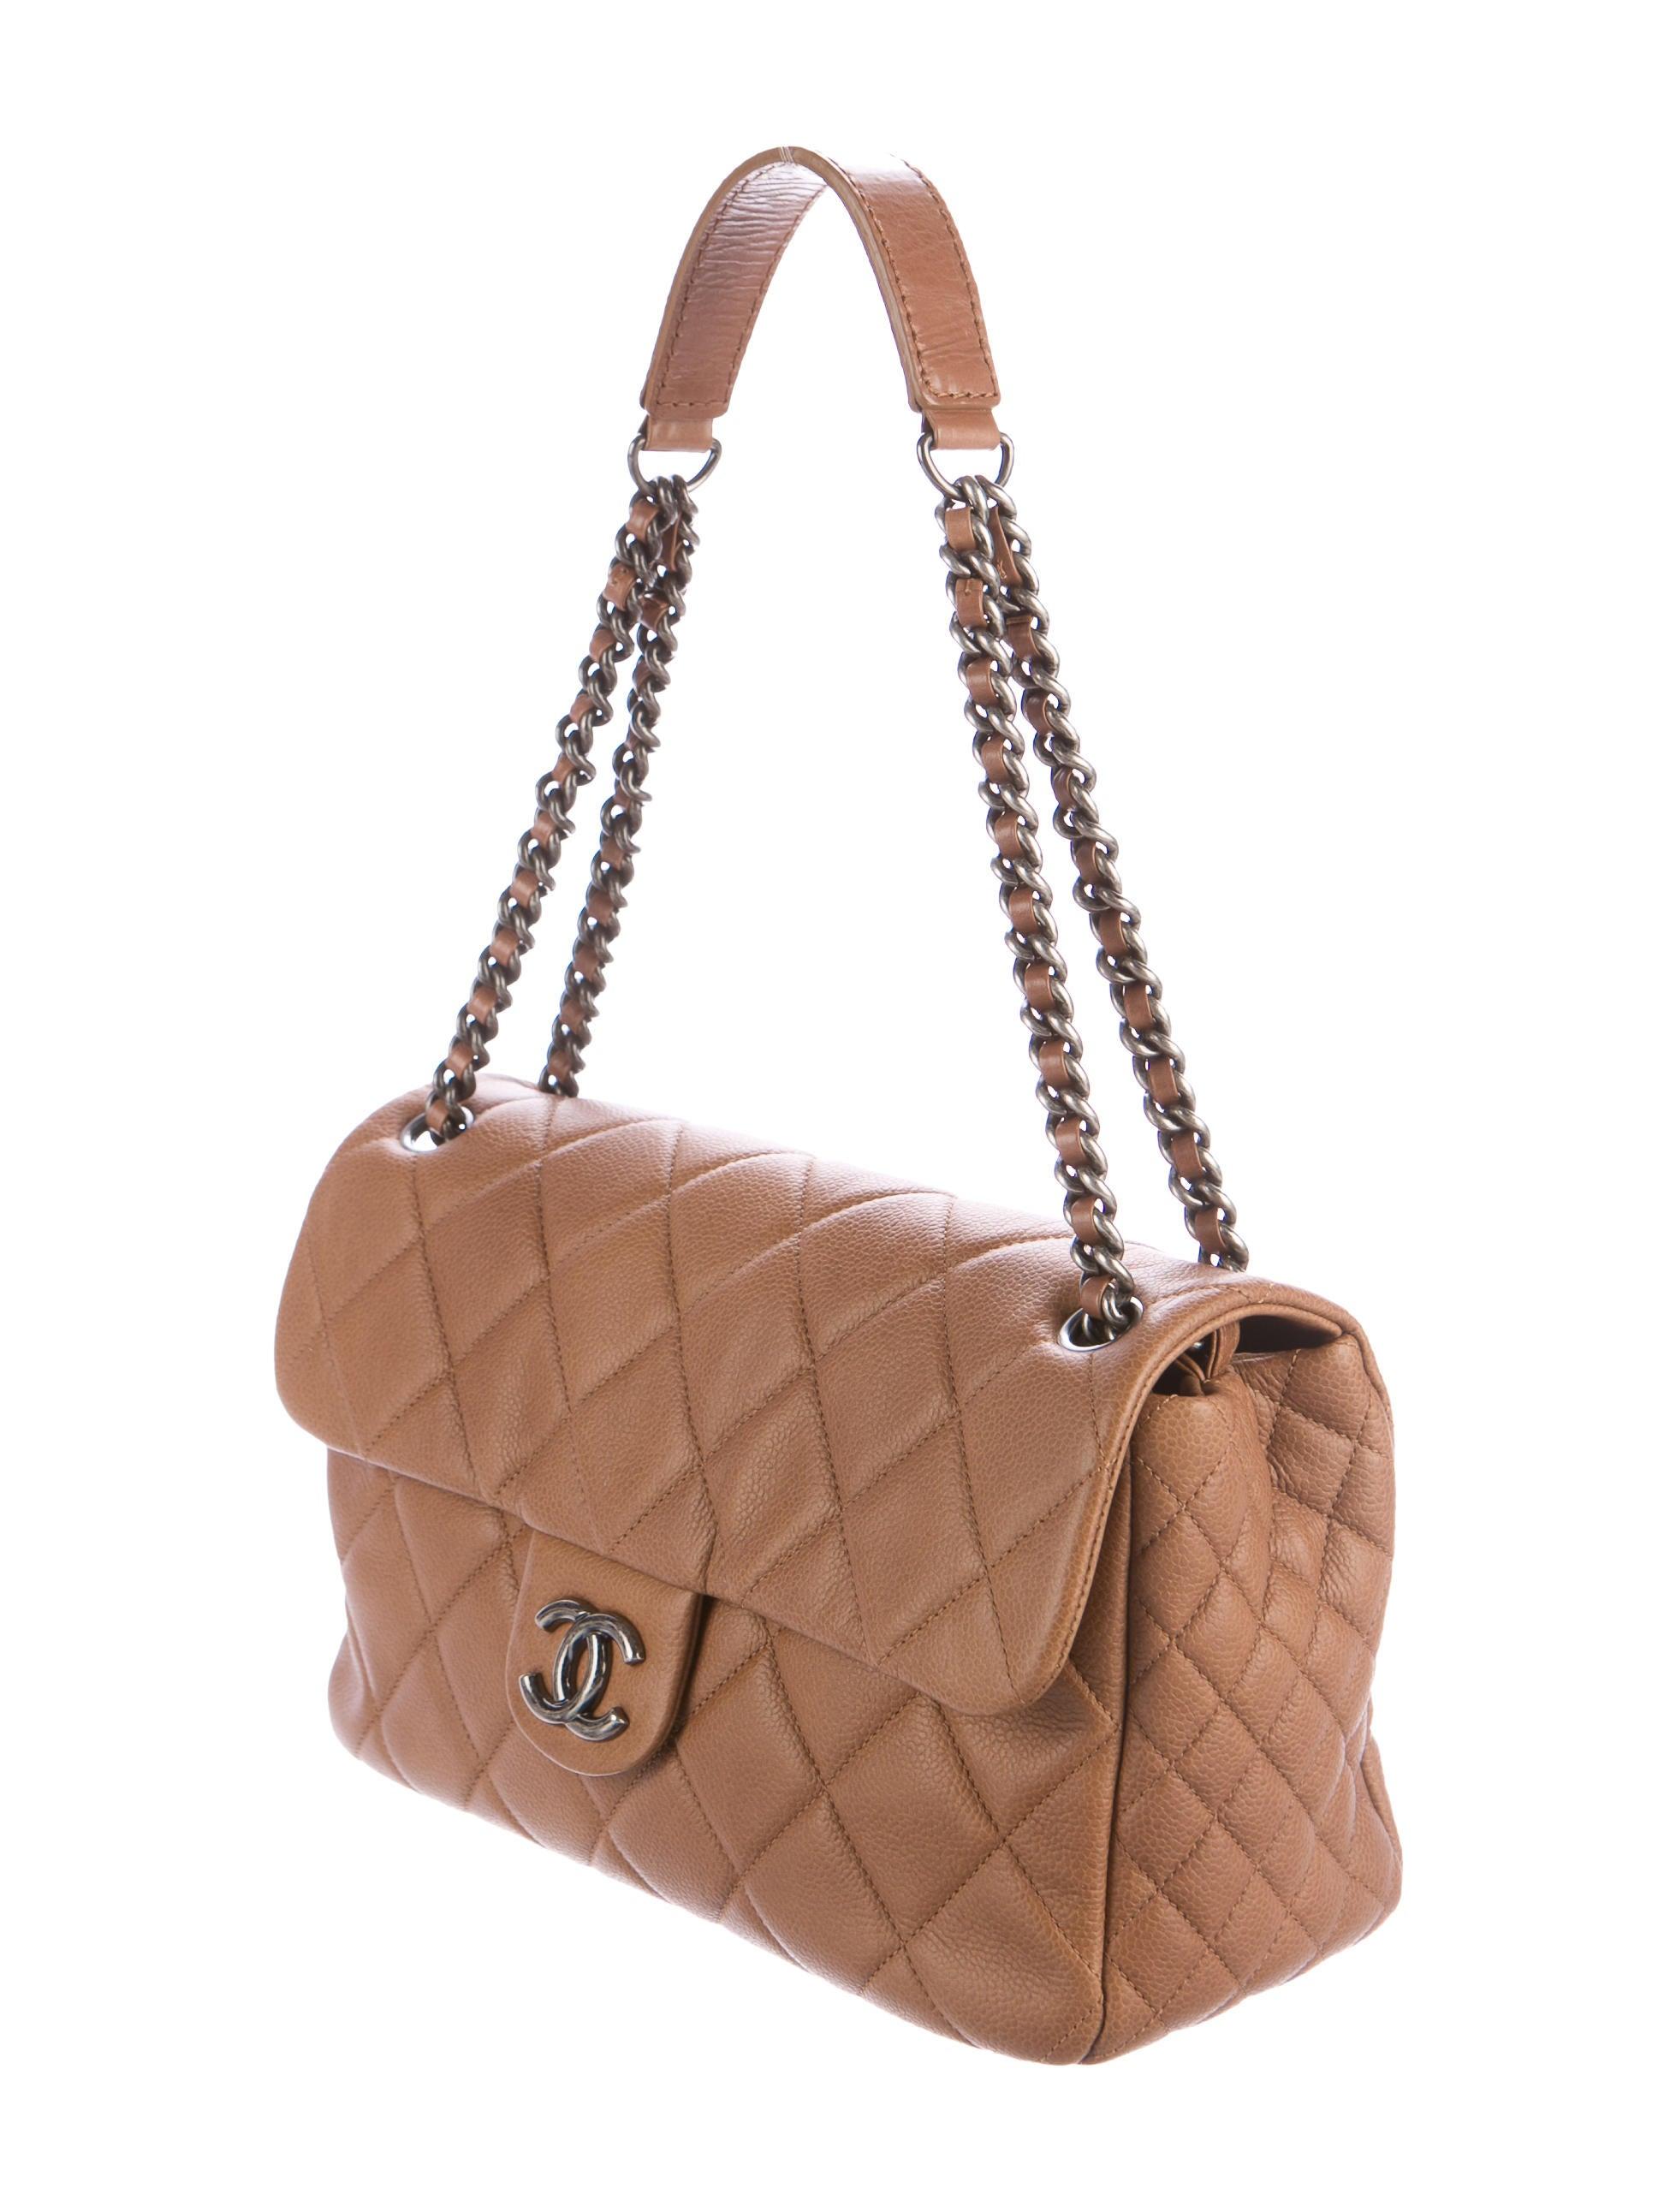 Chanel Coco Casual Flap Bag - Handbags - CHA188292 | The ...